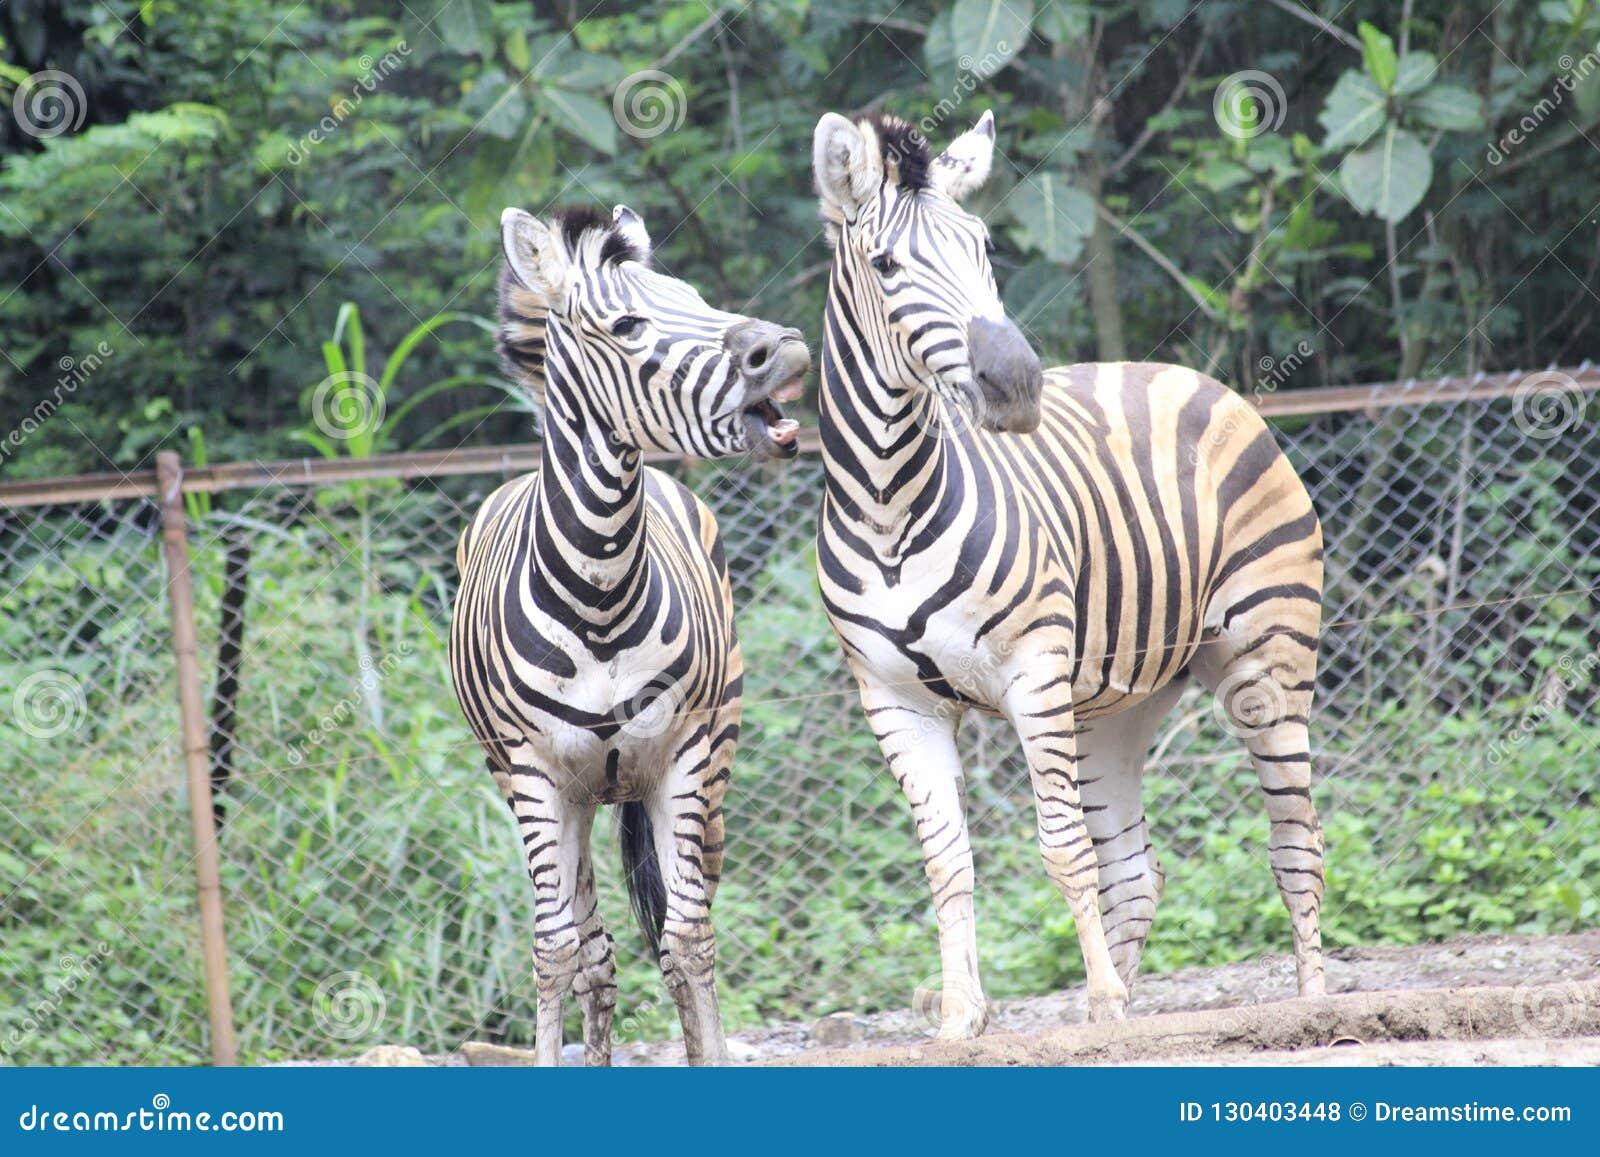 Zebra am Zoo Bandung Indonesien 6